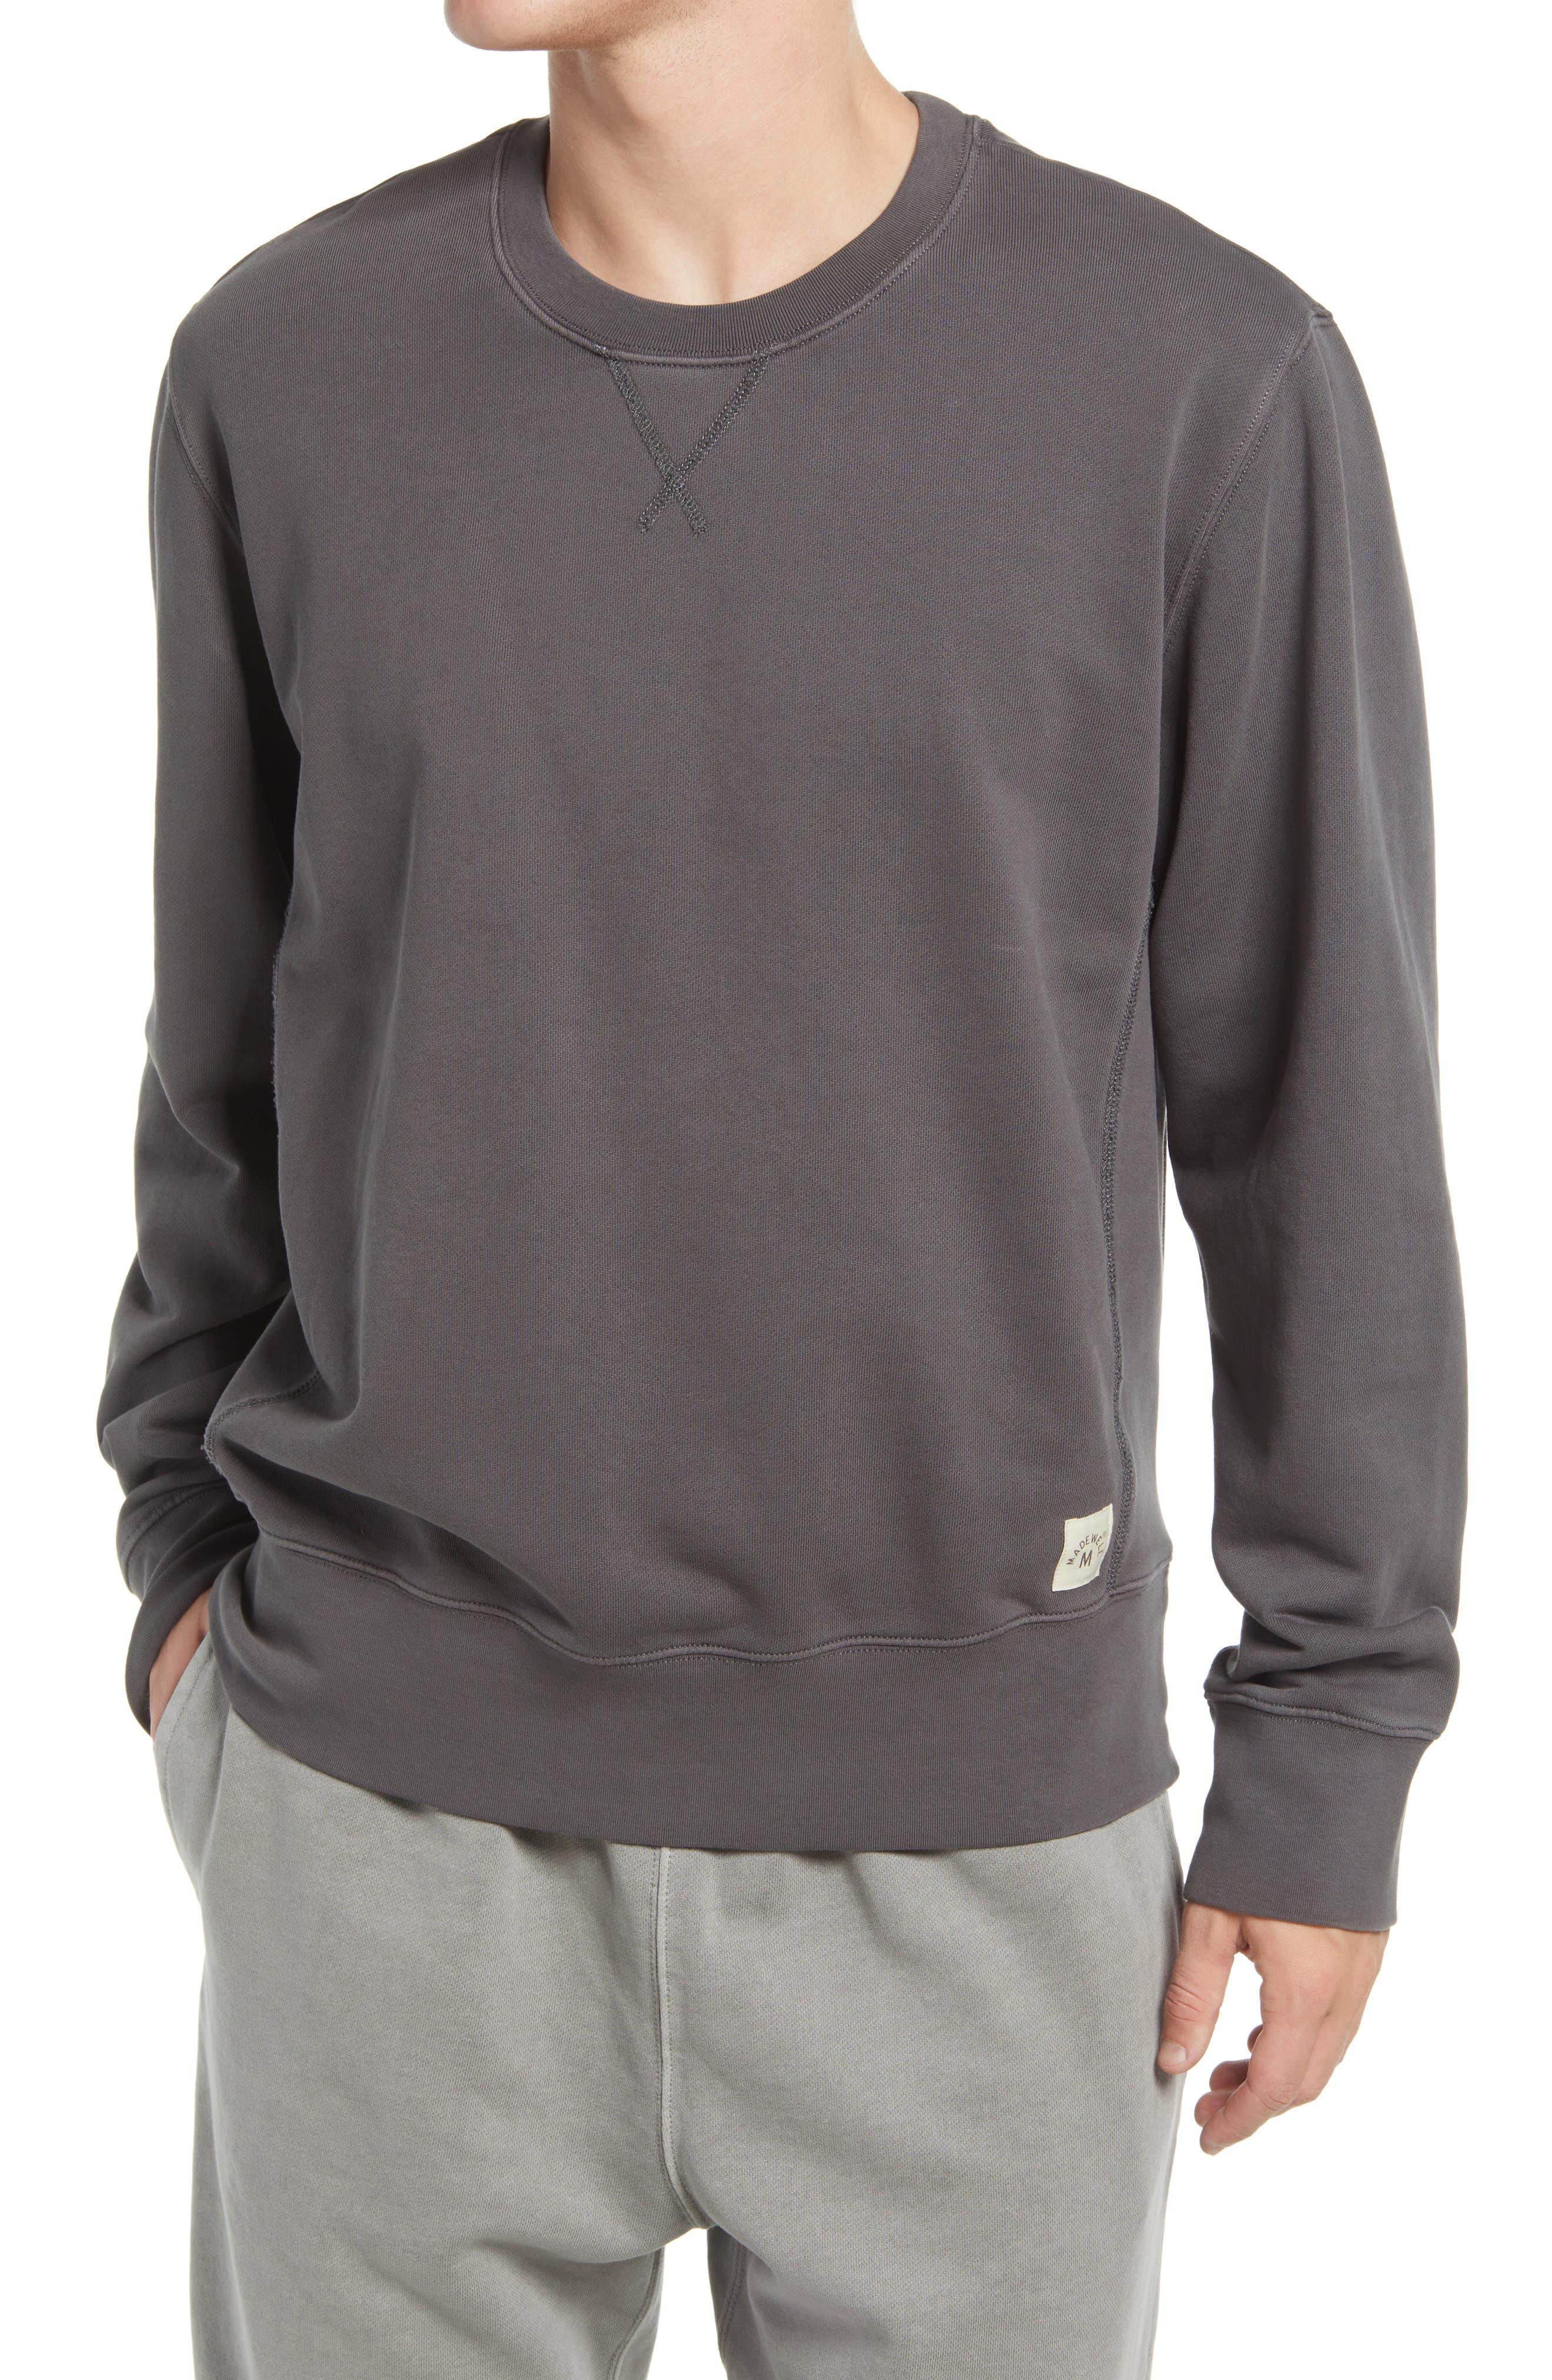 Vintage Terry Boxy Crewneck Sweatshirt